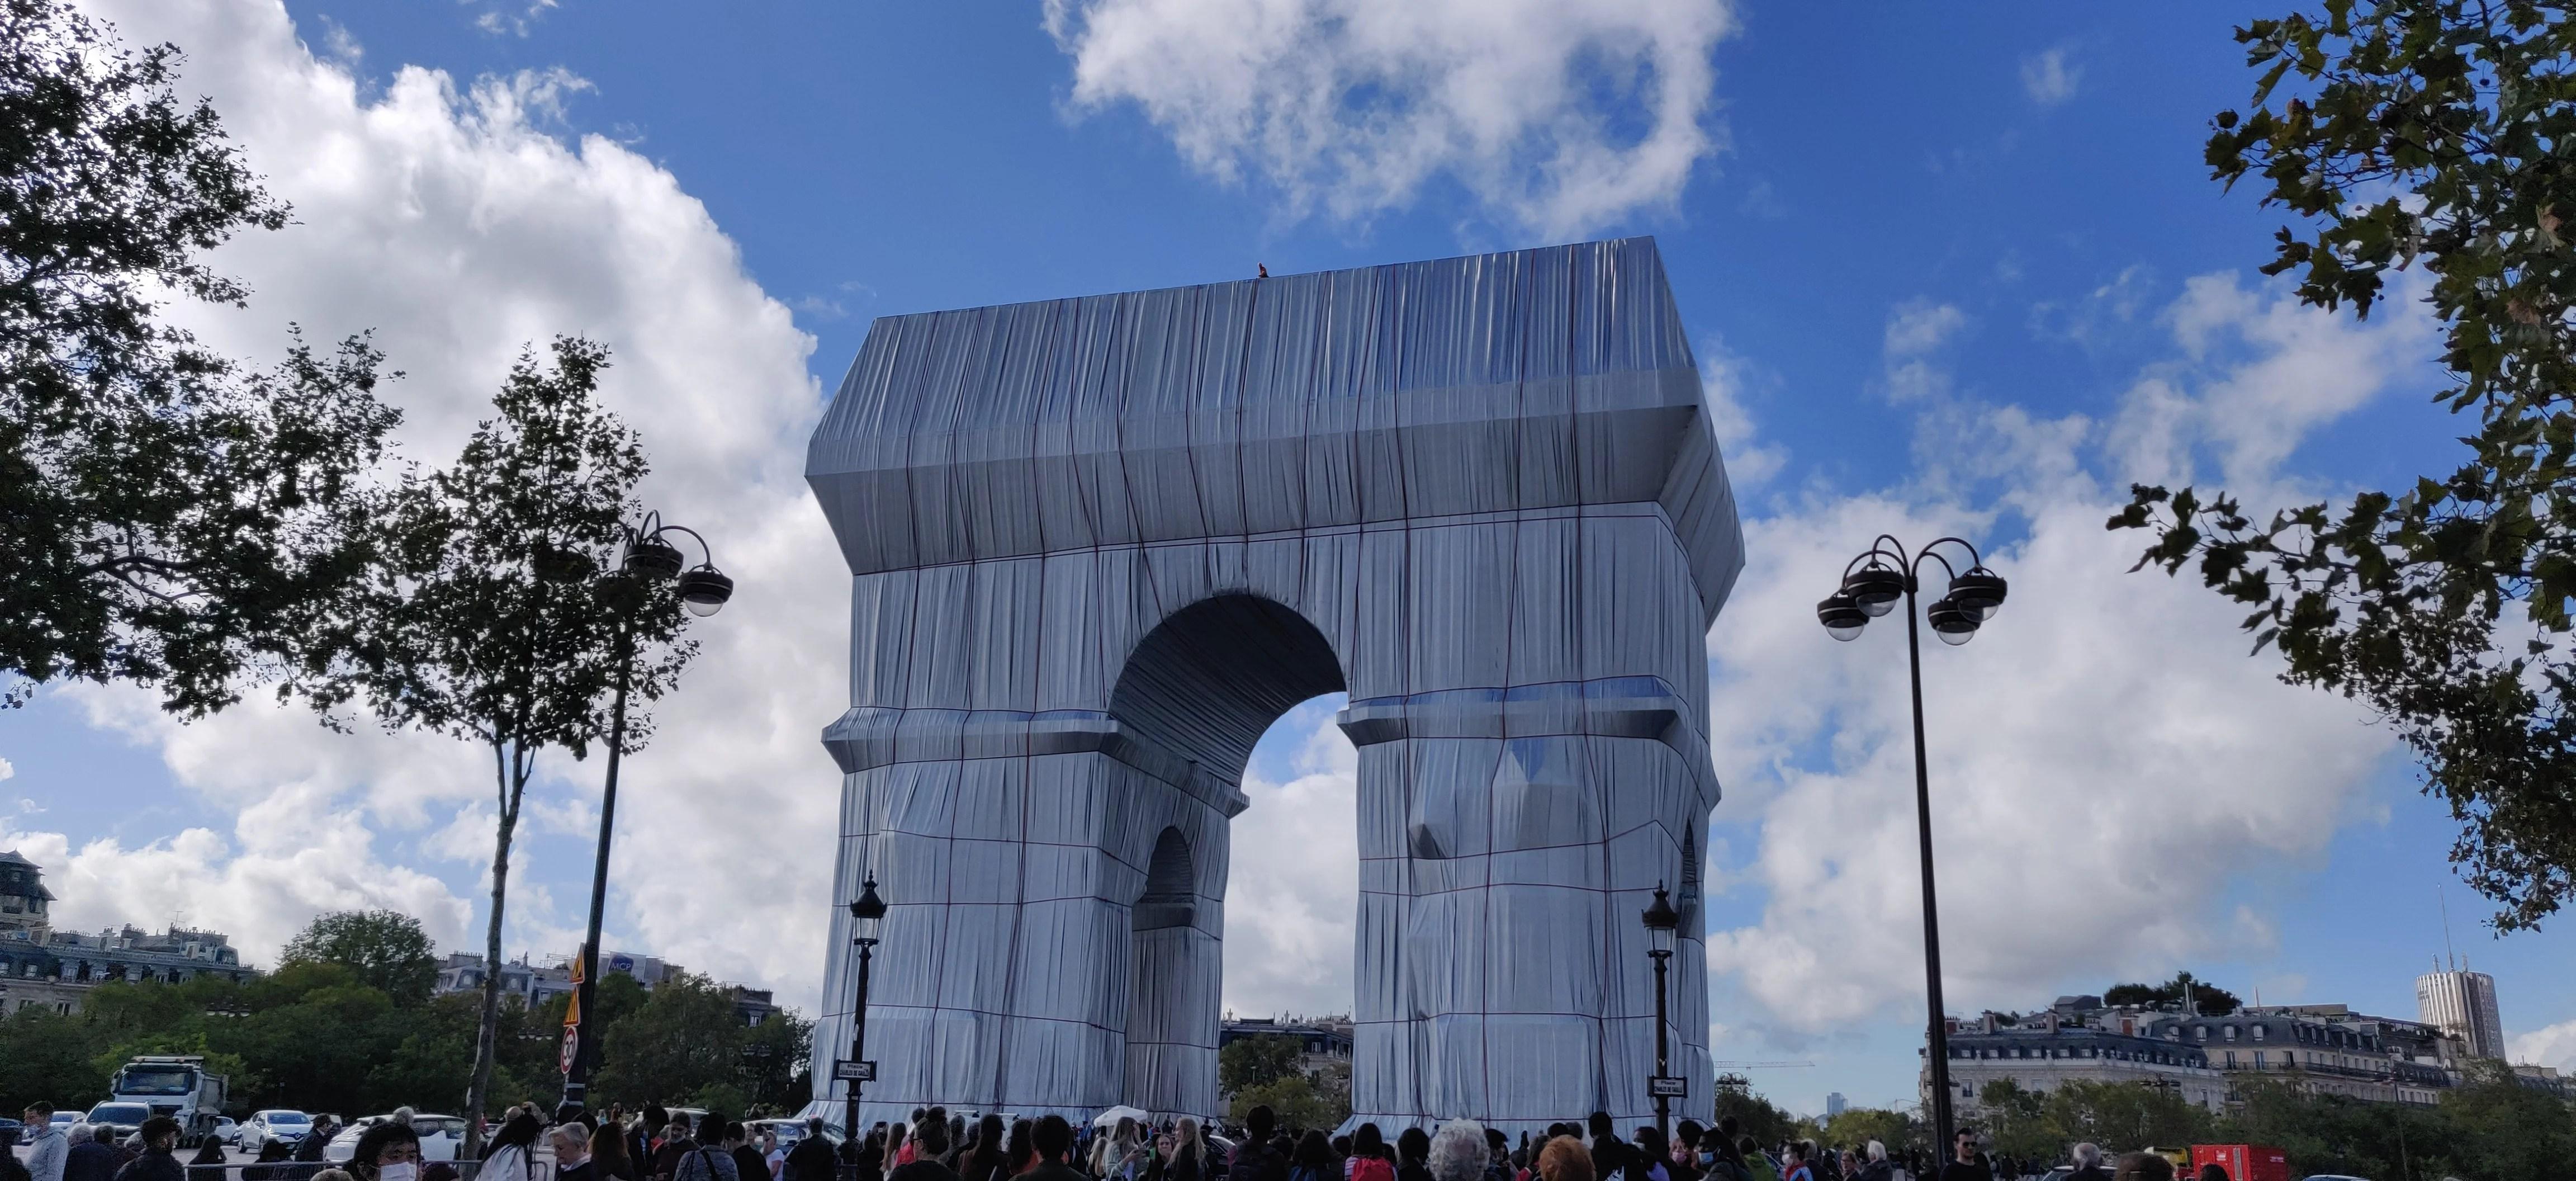 Christo und Jeanne Claude: L'Arc de Triomphe Wrapped